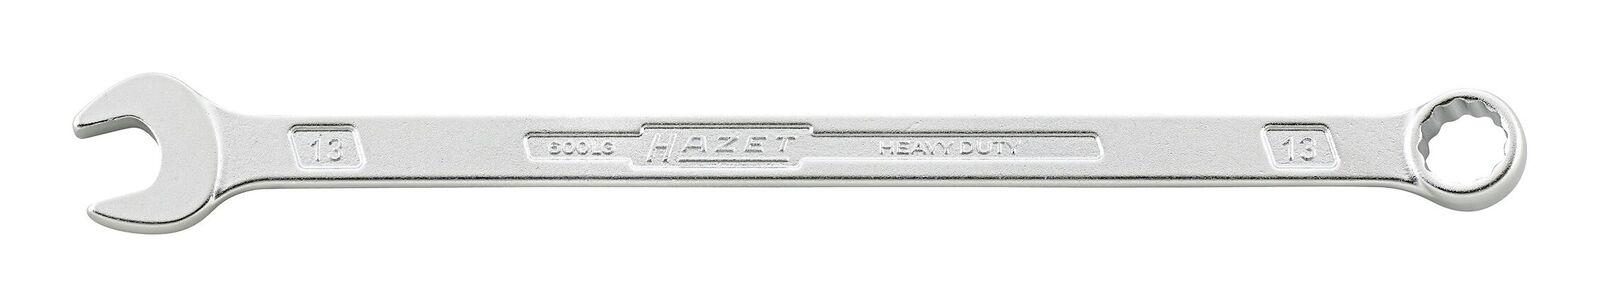 Hazet Ringmaulschlüssel ä. DIN 3113 A 36 mm extra lang - 600LG-36